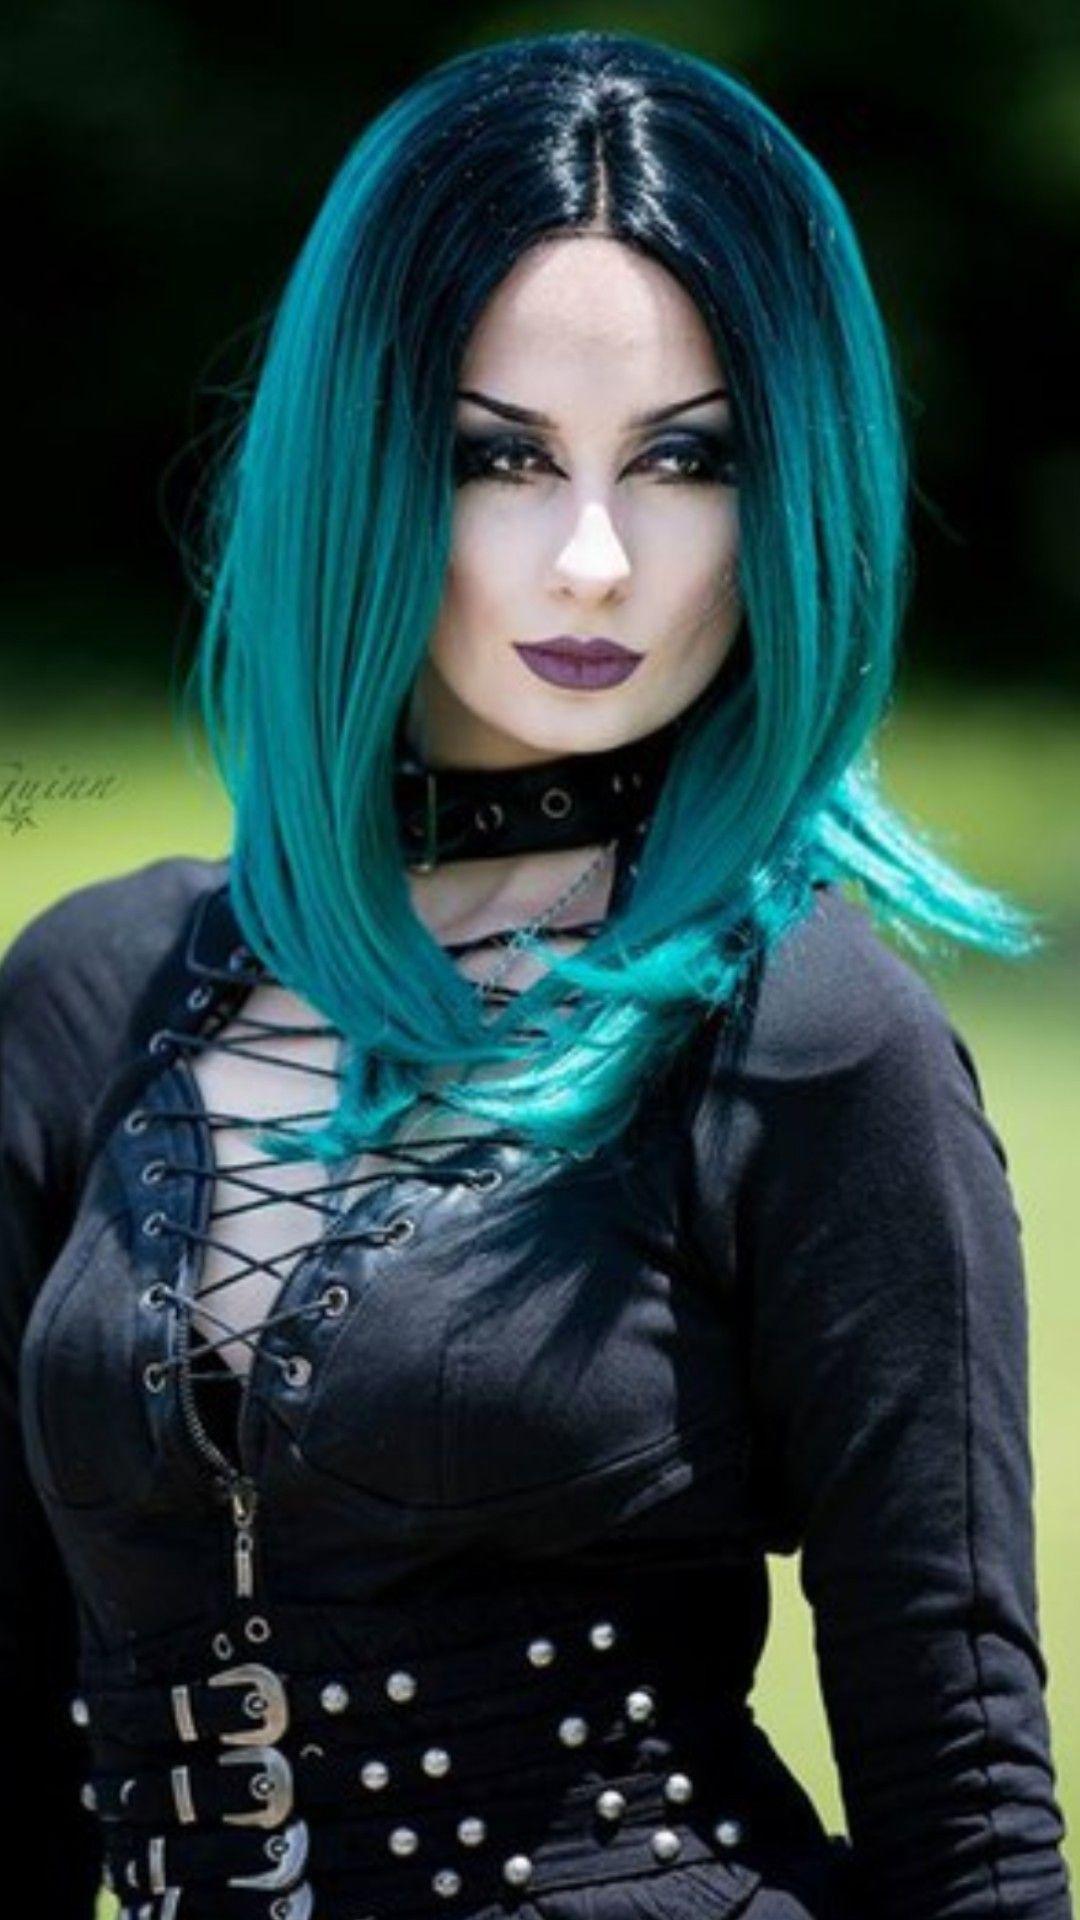 Pin by Spiro Sousanis on BLACK METAL BARBIE Pinterest